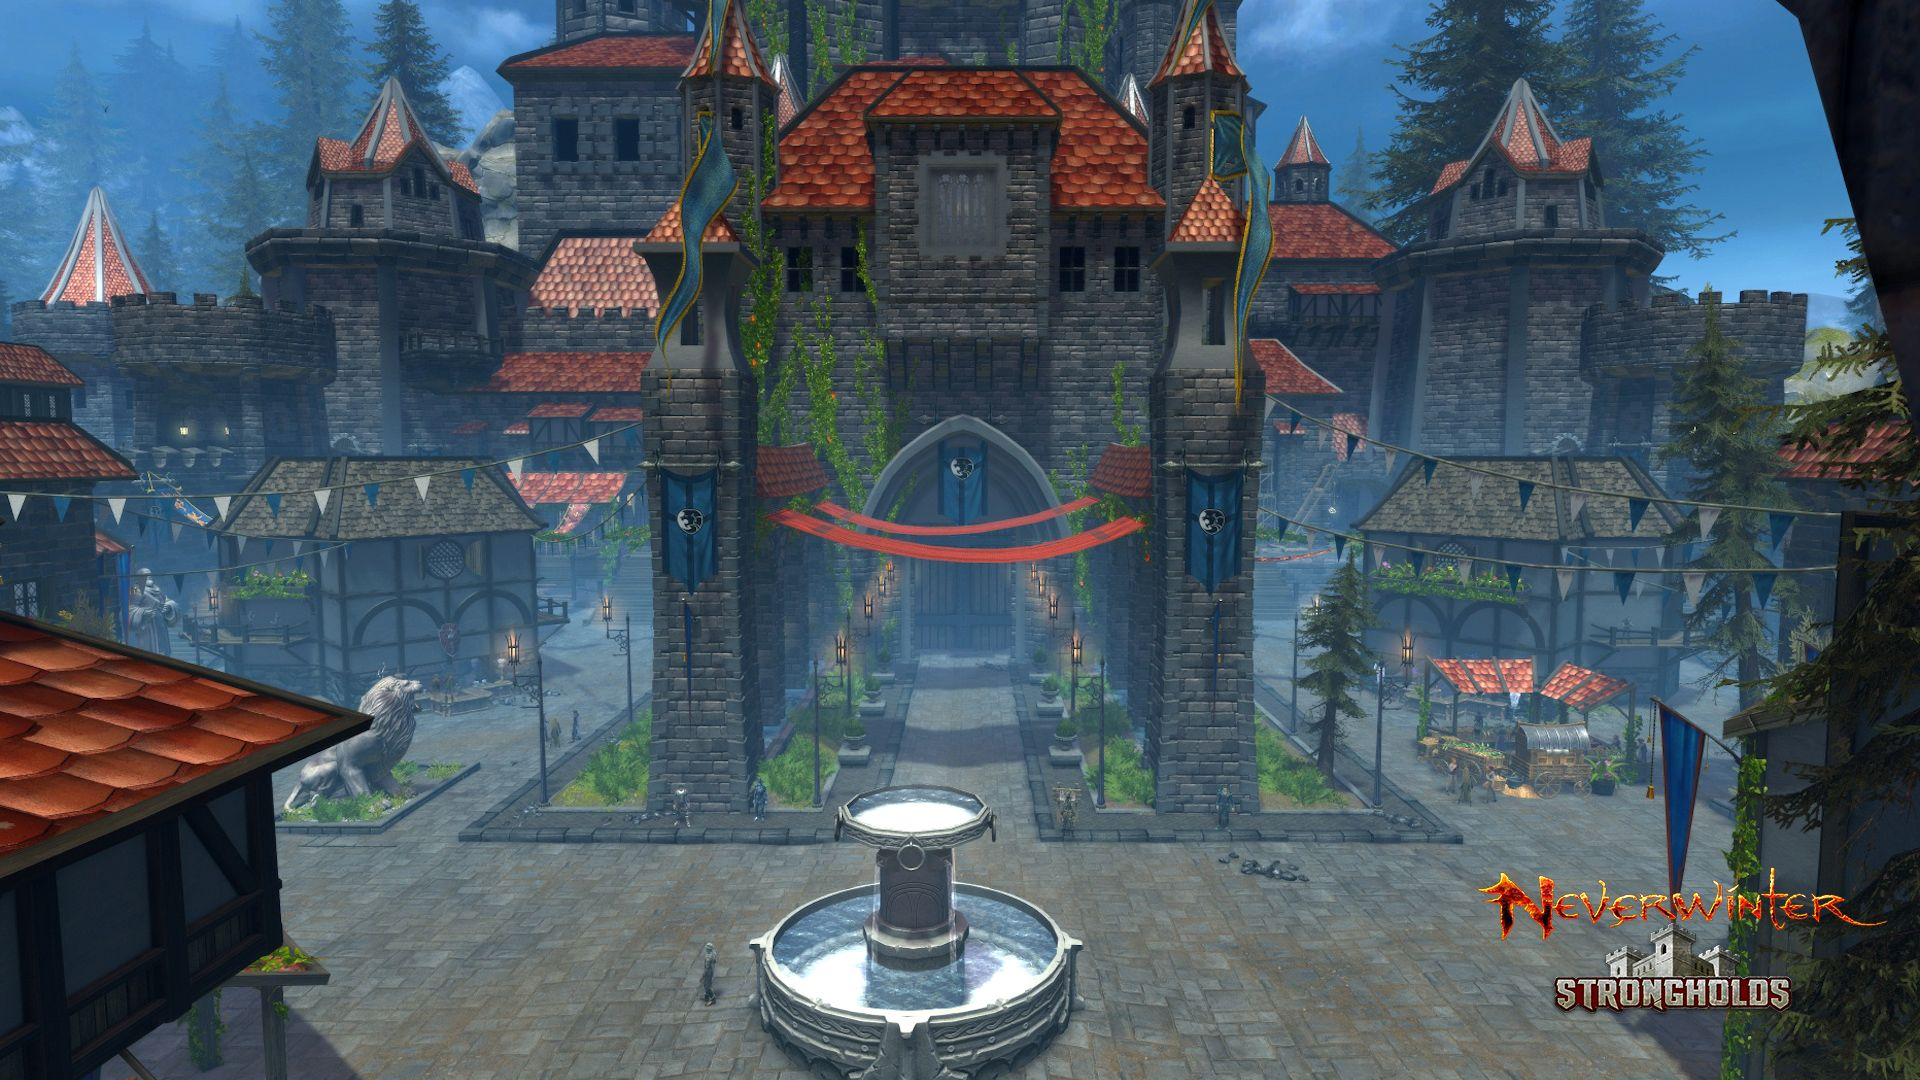 Neverwinter Strongholds Press Event Recap